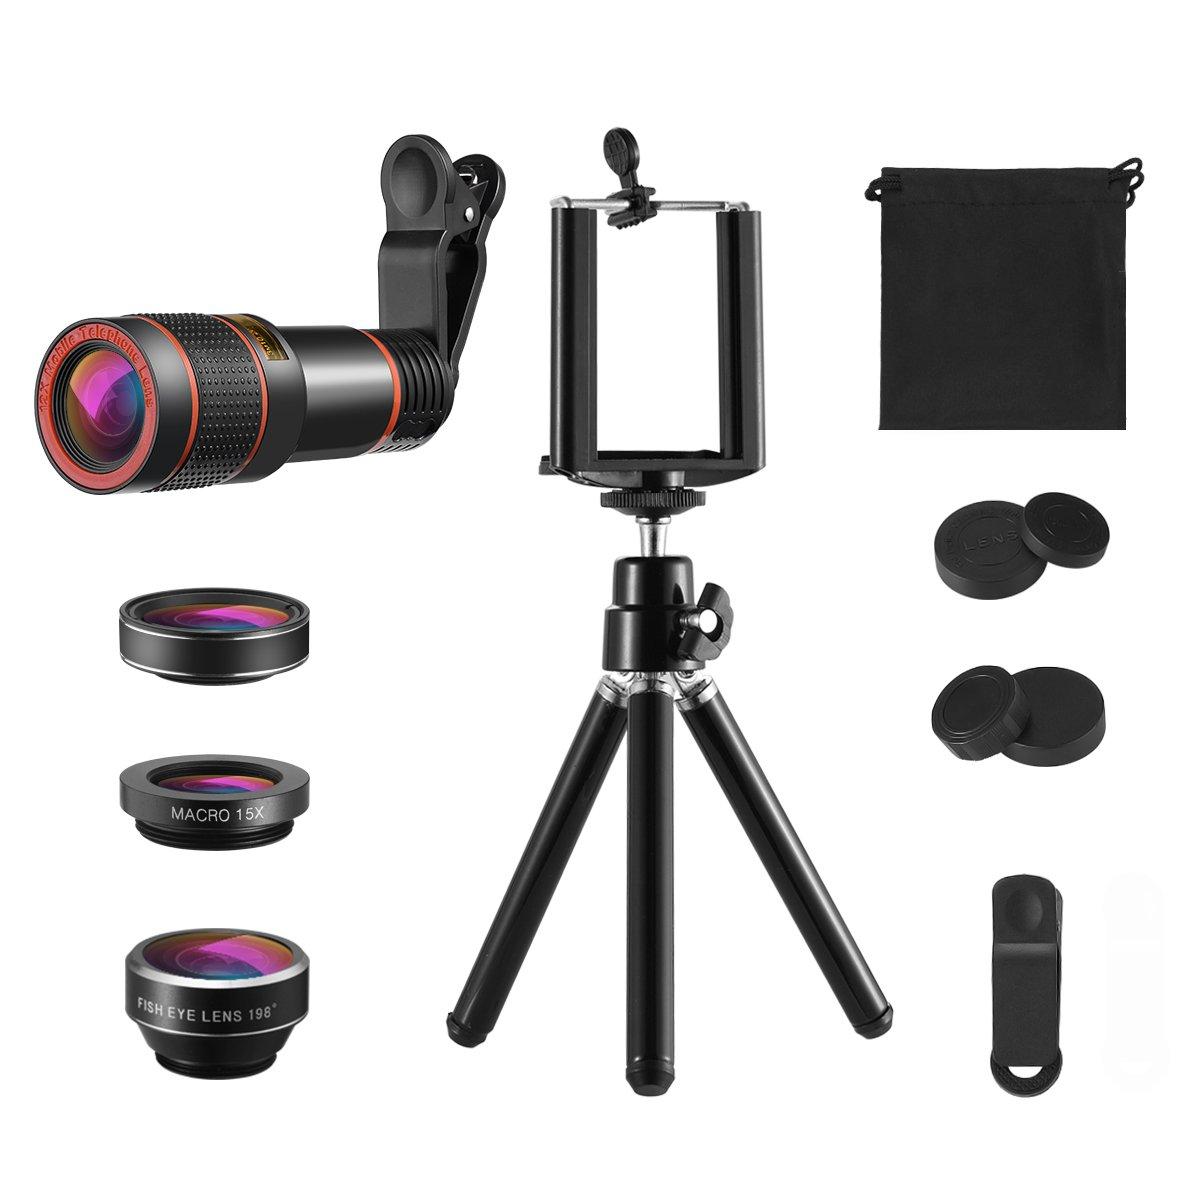 KeeKit 4 in 1 Cell Phone Camera Lens Kit, 12X Telephoto Lens + 198° Fisheye + Macro Lens + Wide Angle +Phone Holder + Tripod for iPhone X/8/8 Plus/7/7 Plus/6s, Huawei, Samsung & Smartphones by KeeKit